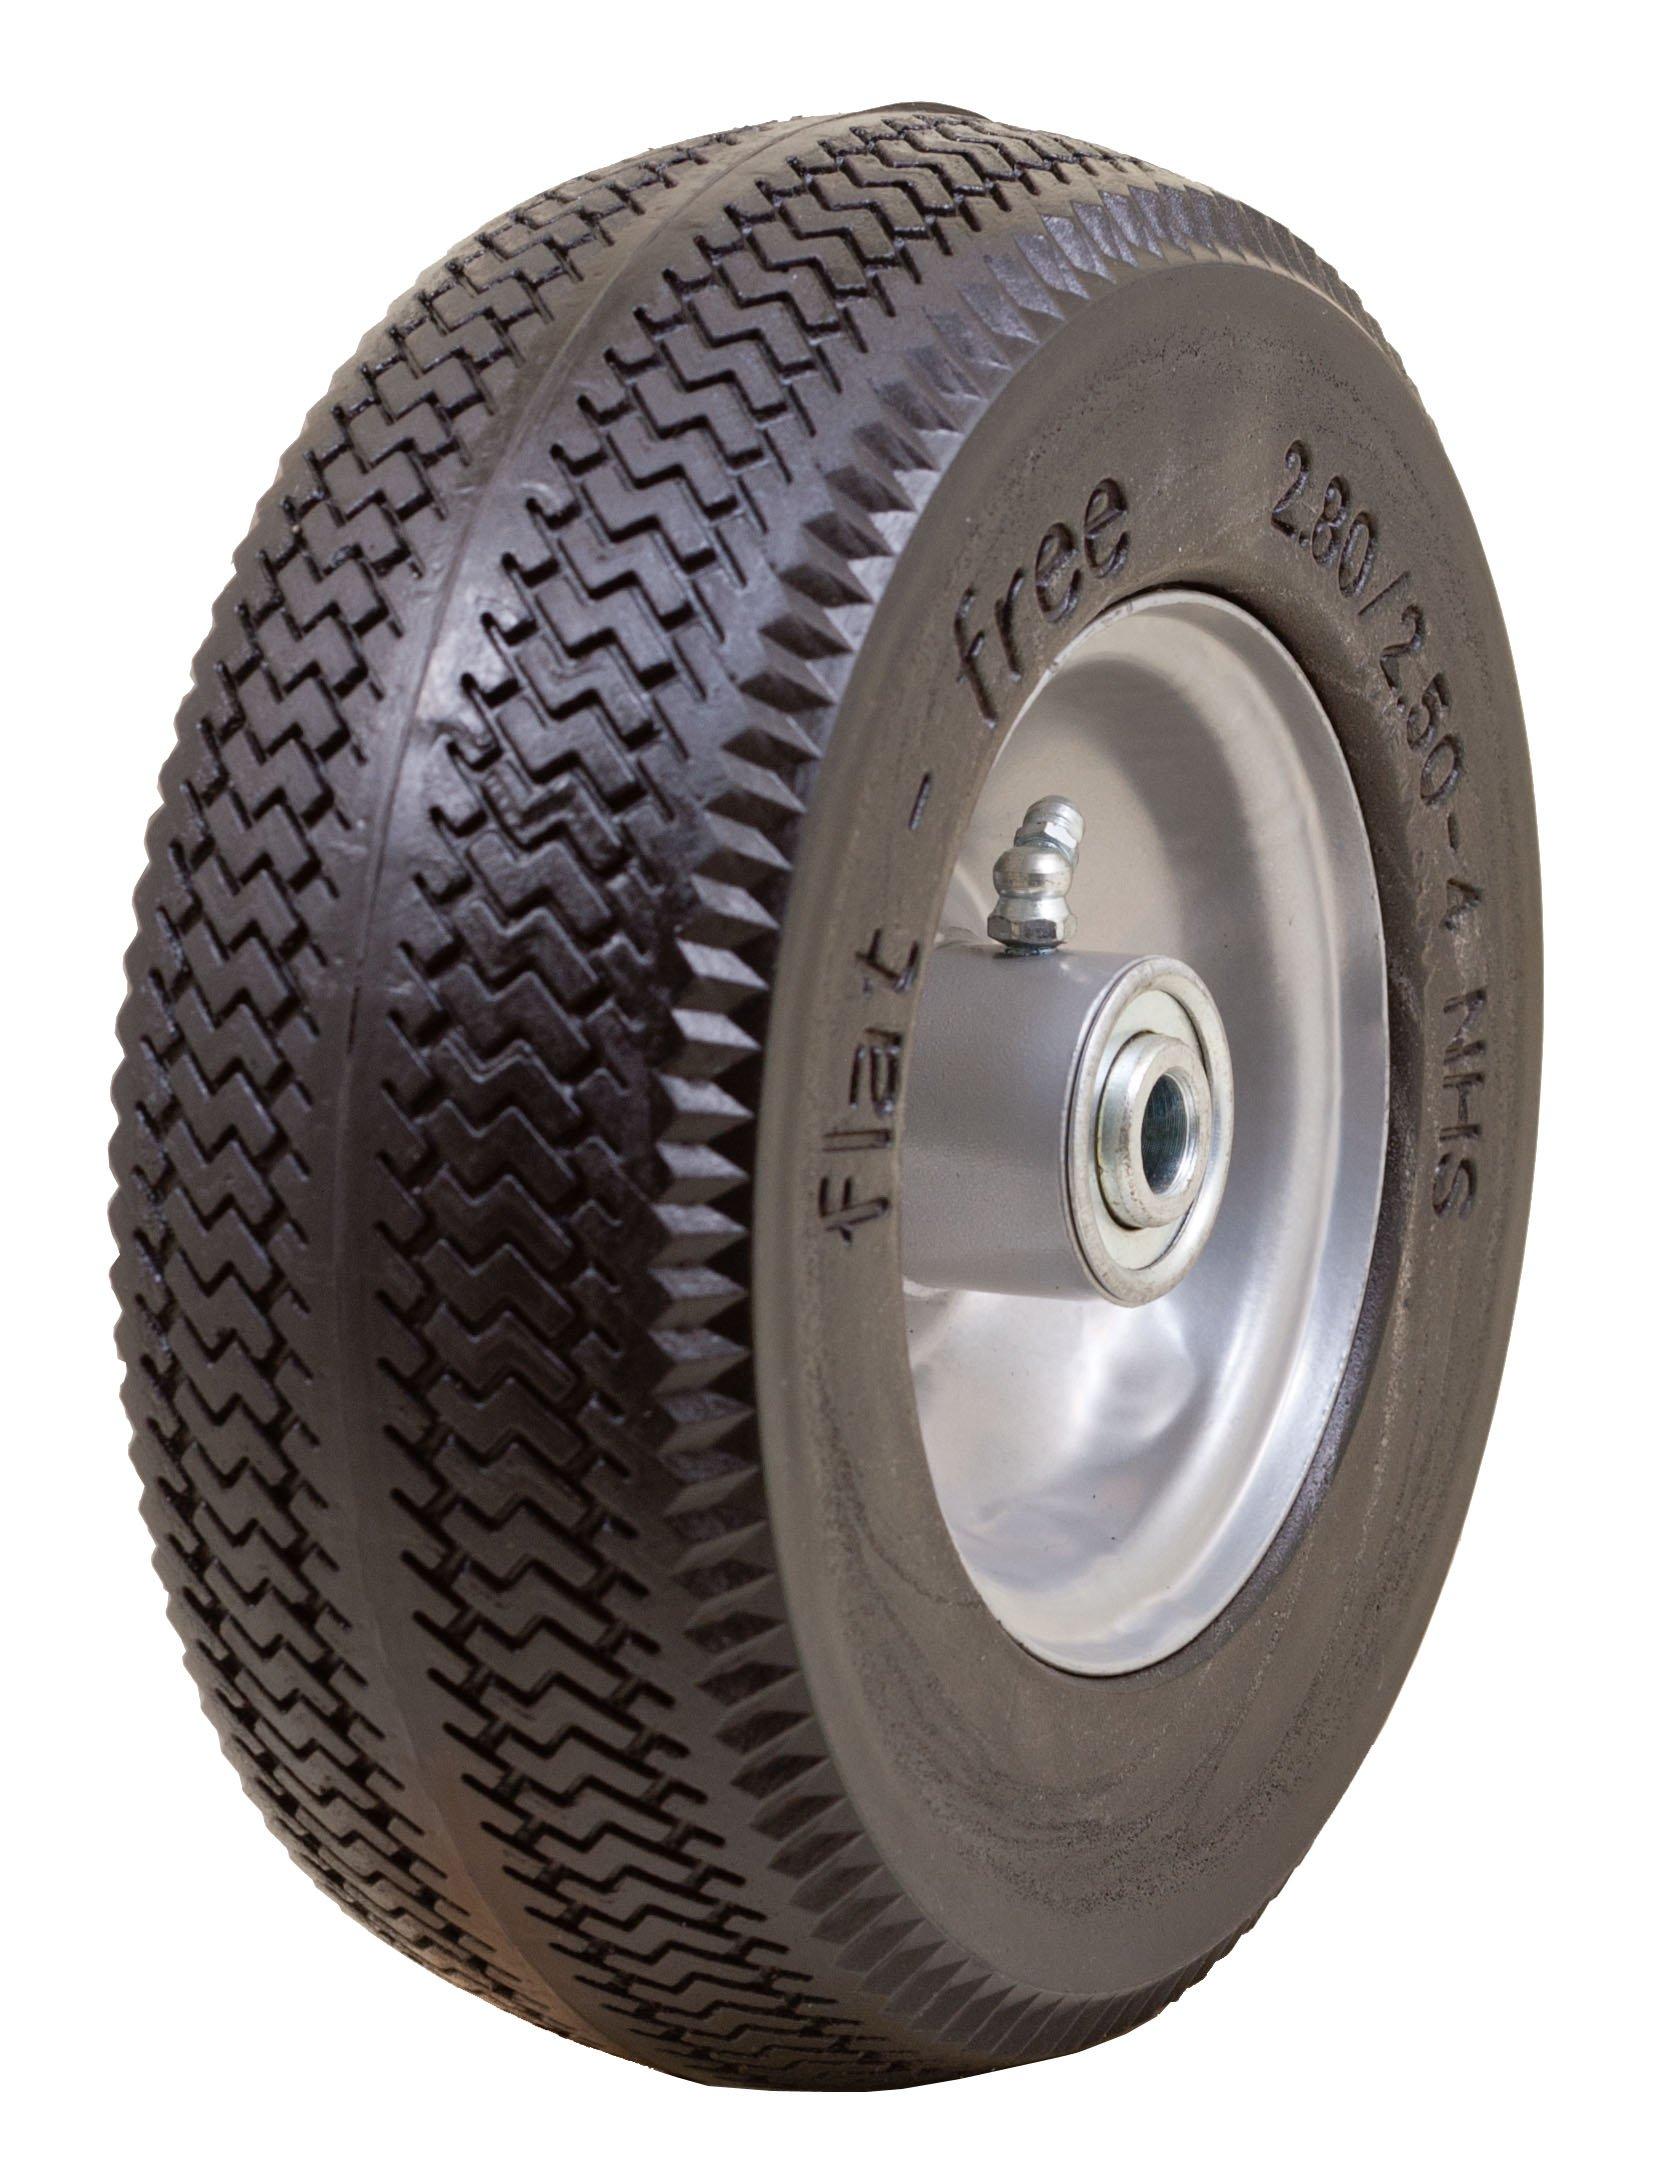 Marathon 2.80/2.50-4'' Flat Free Hand Truck/Utility Cart Tire on Wheel, 3''Centered Hub, 1/2'' Bearings